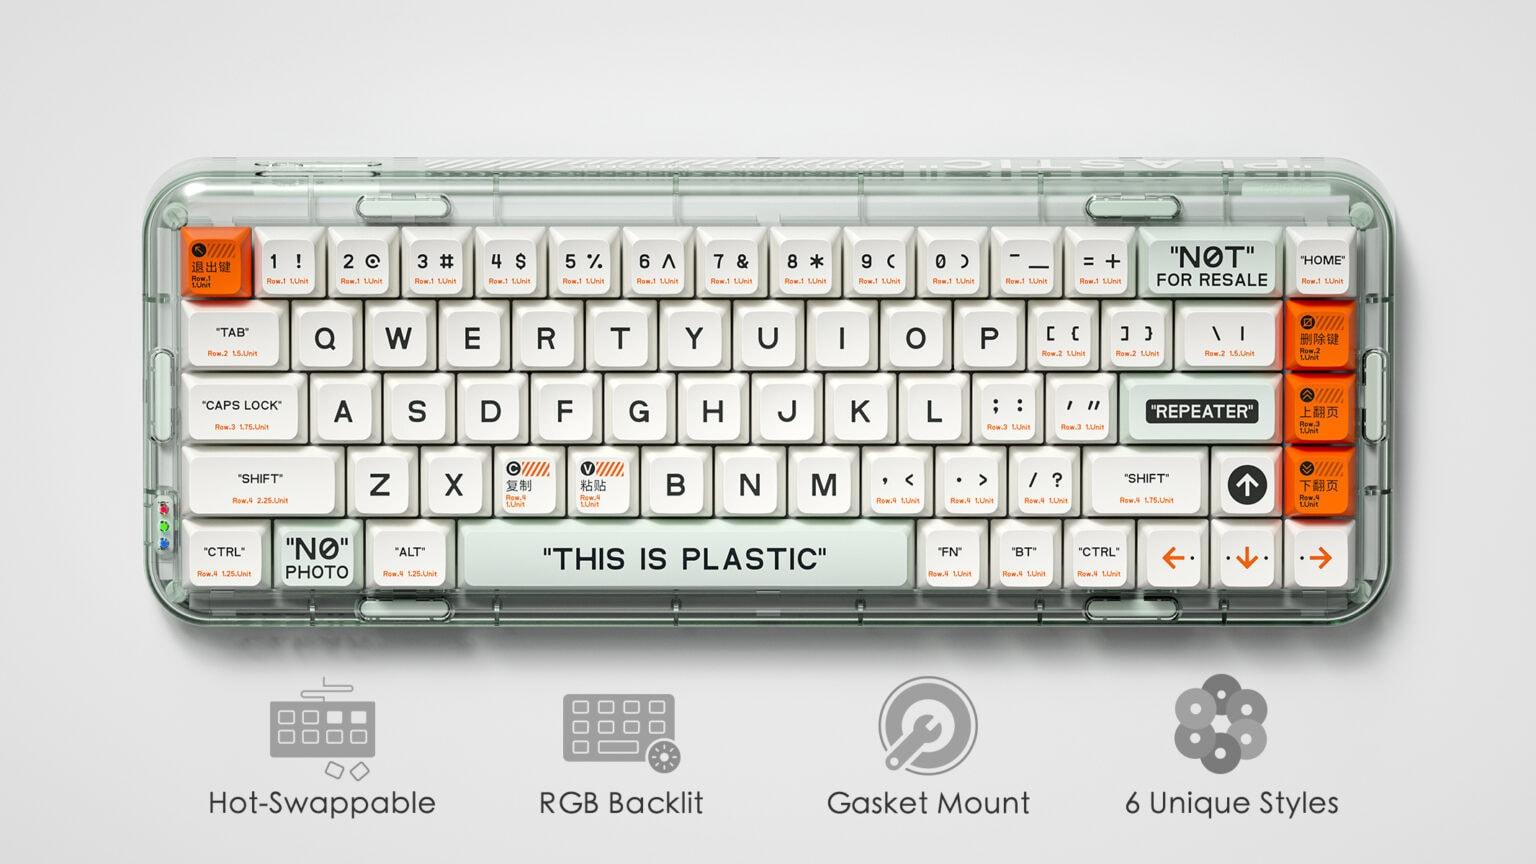 MelGeek's new Mojo68 mechanical keyboard is see-through.